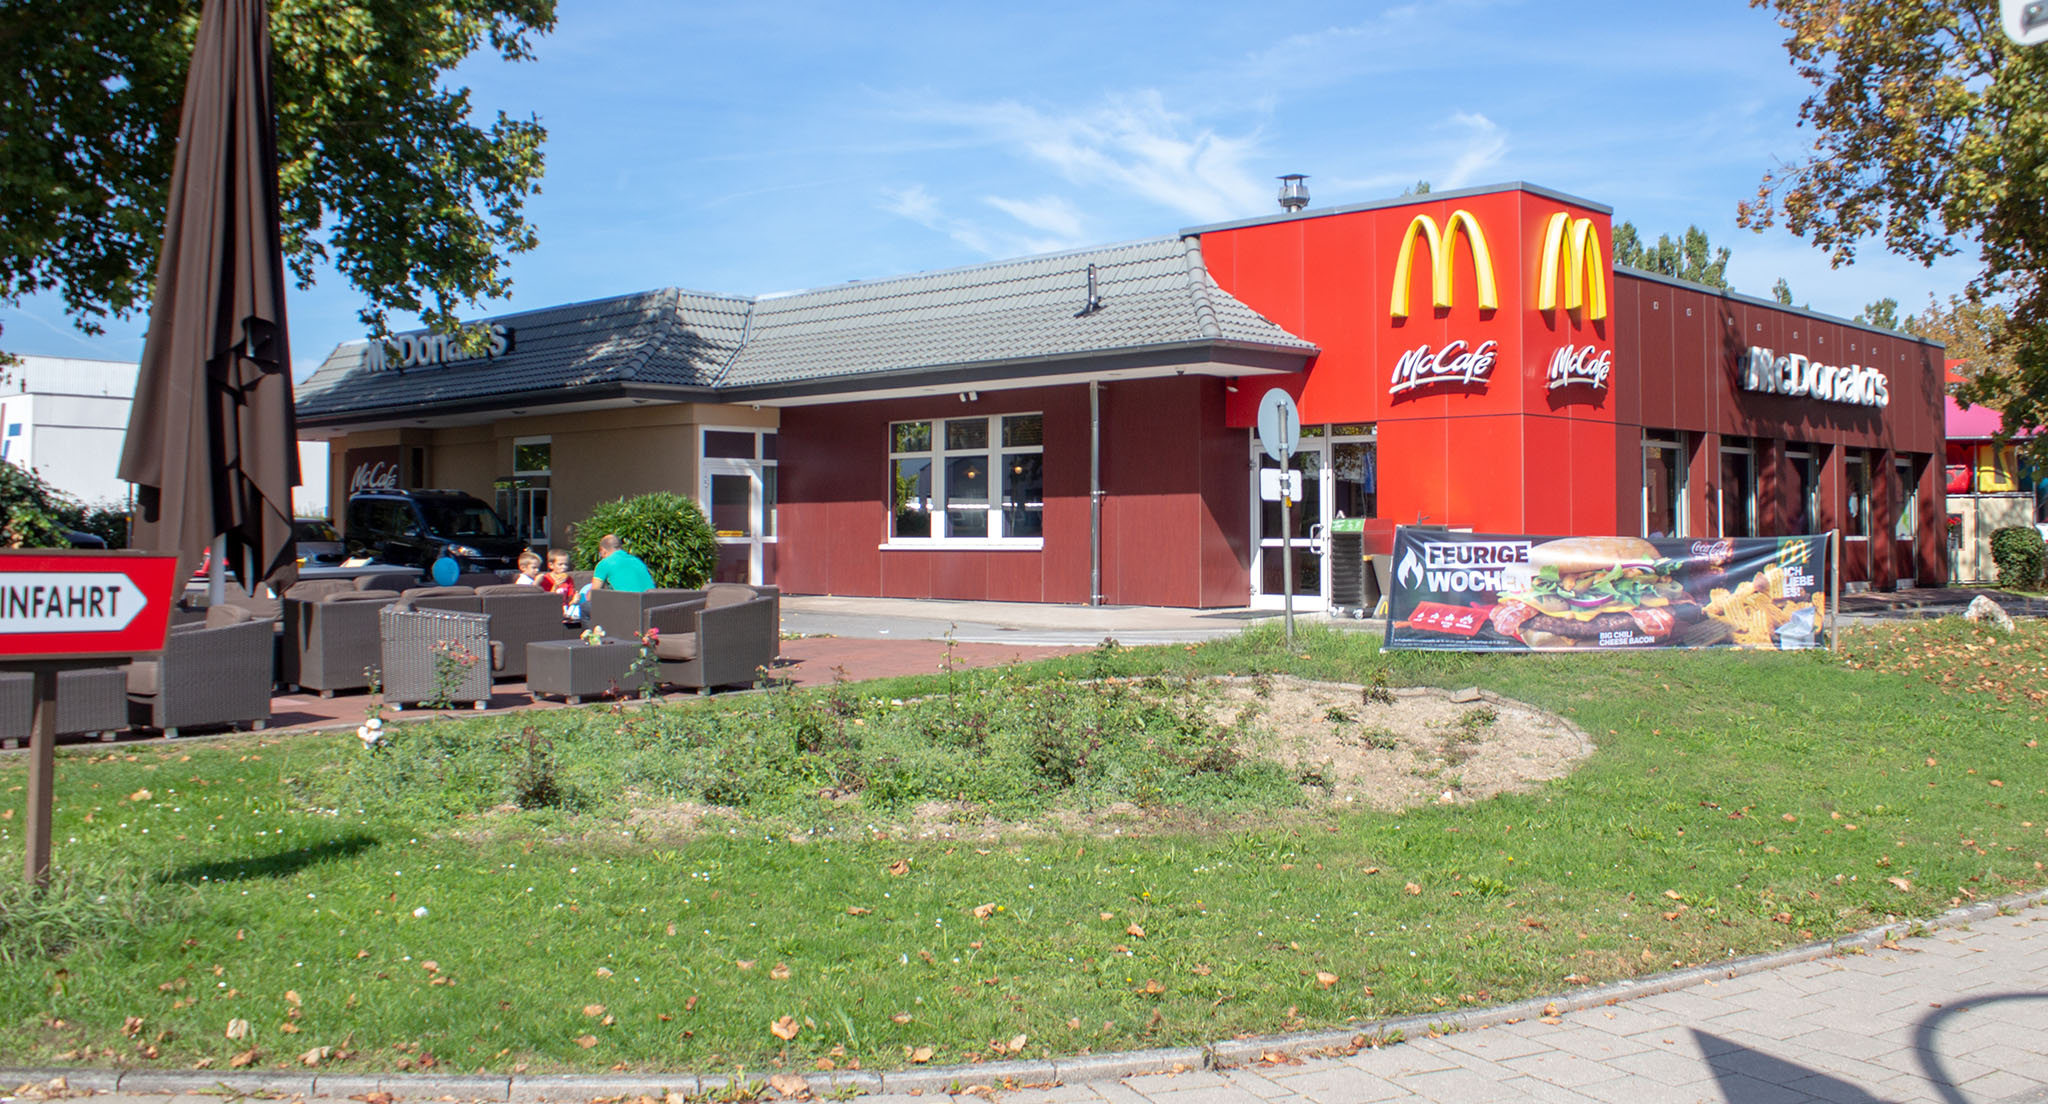 McdonaldS Restaurant Regensburg